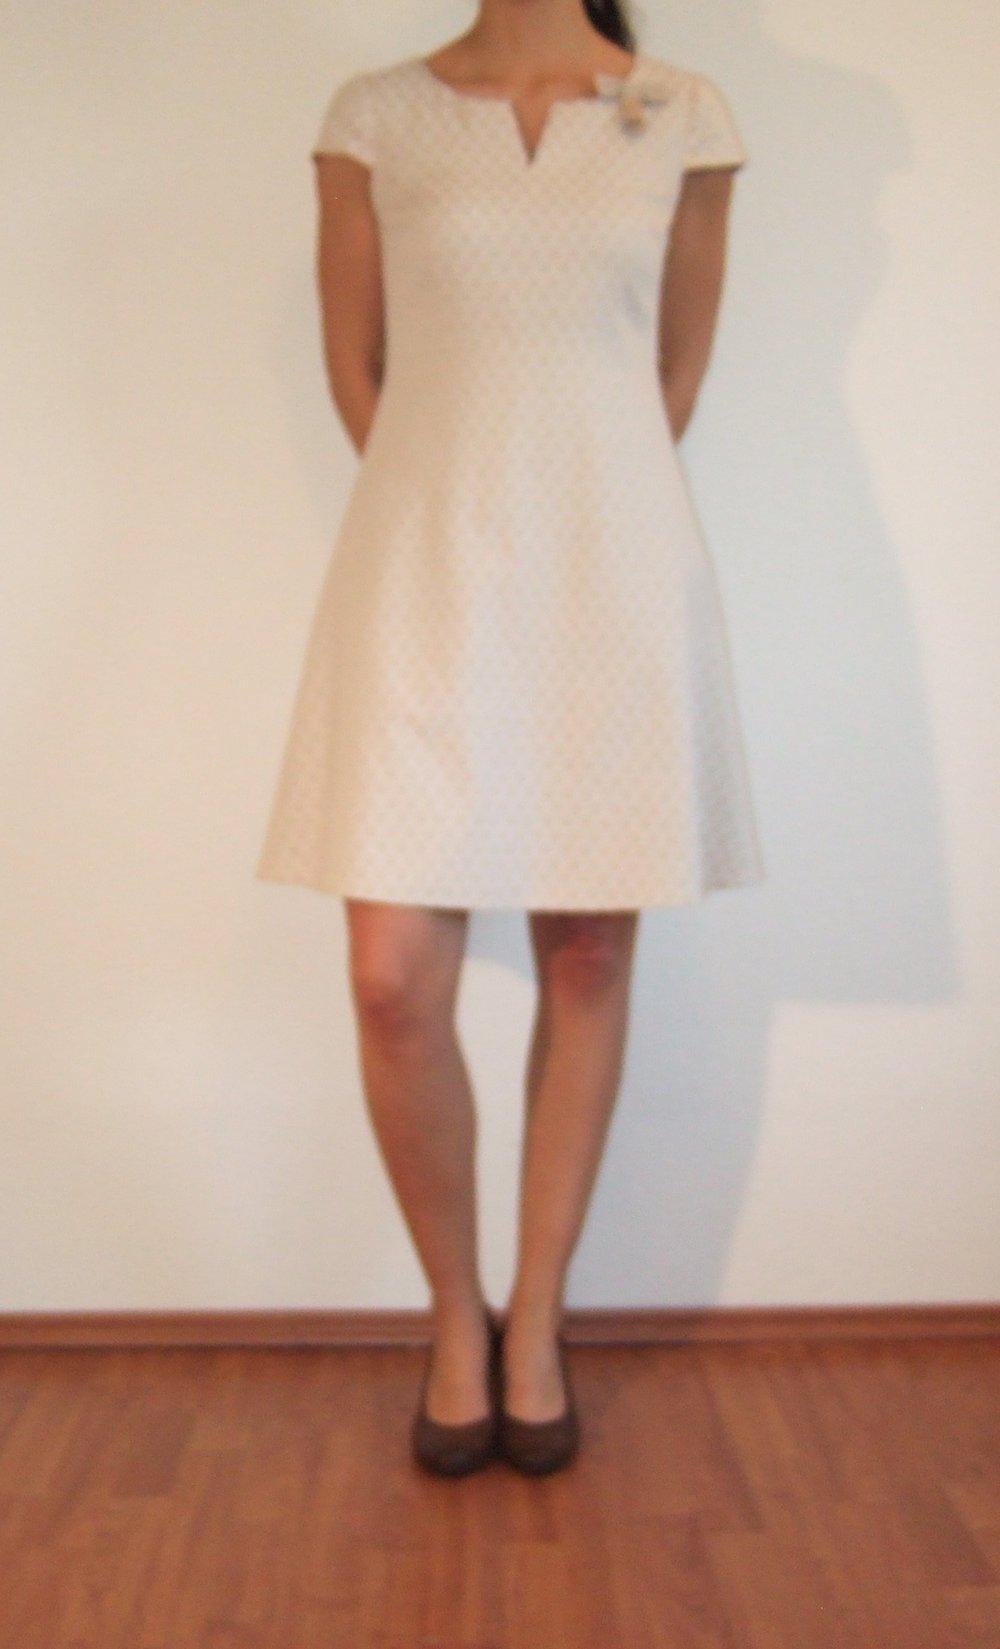 Von Süßes Cremefarbenes Comma Kleid Cremefarbenes Comma Süßes Kleid Von xBoerdC